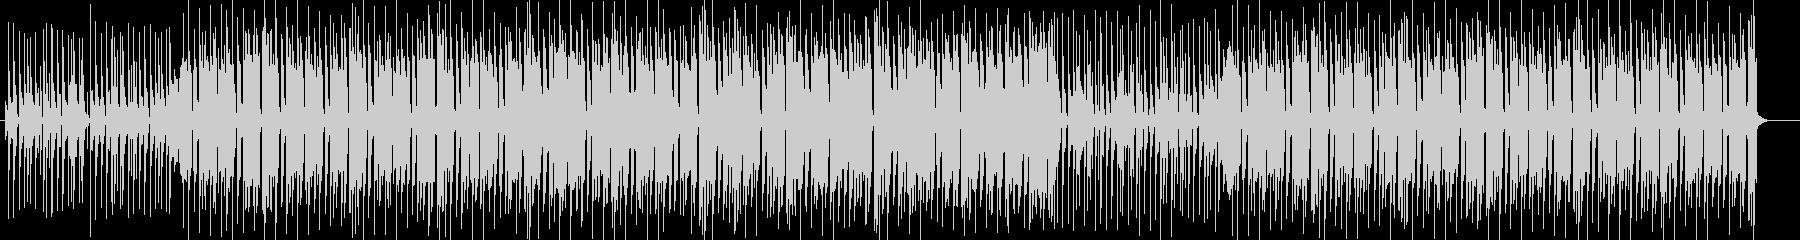 Cosmic synthesizer pop sound's unreproduced waveform